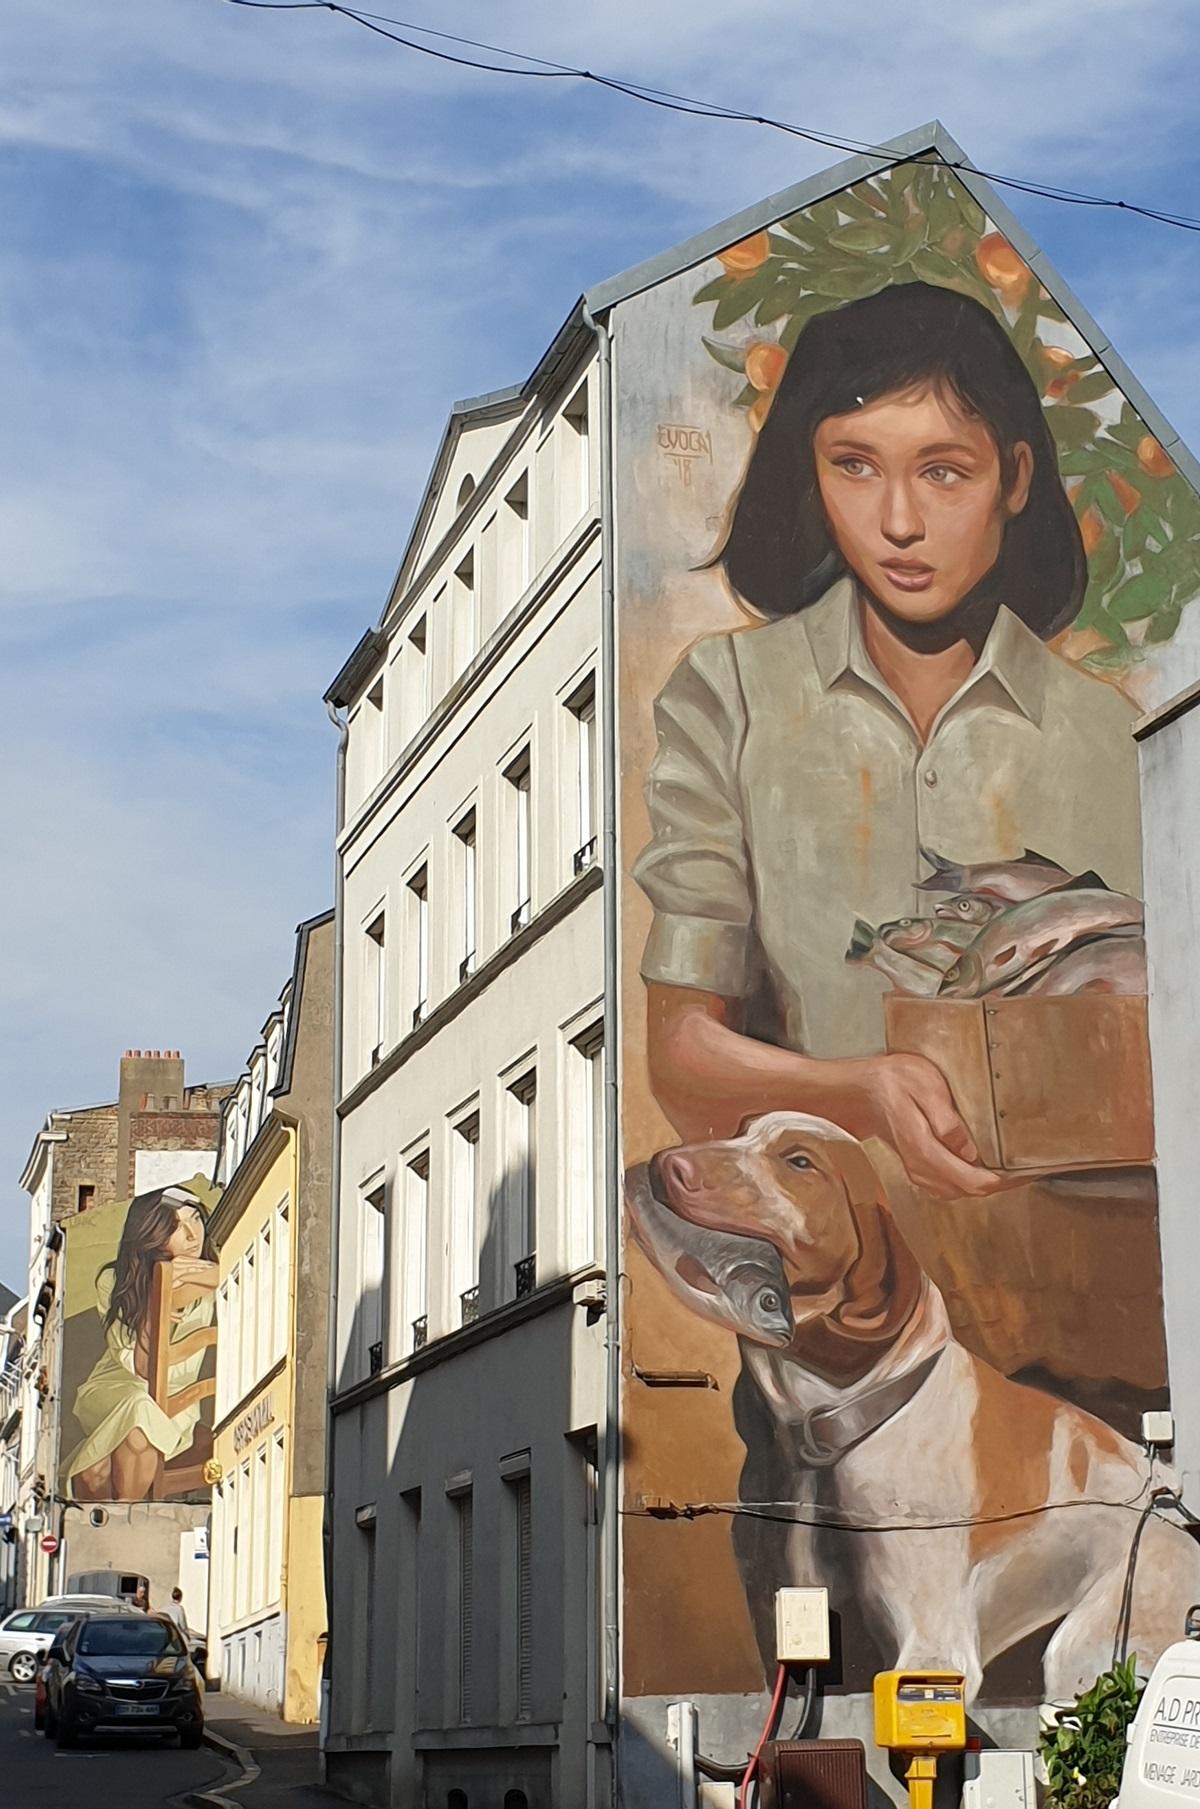 Street_art2_Boulogne_sur_Mer